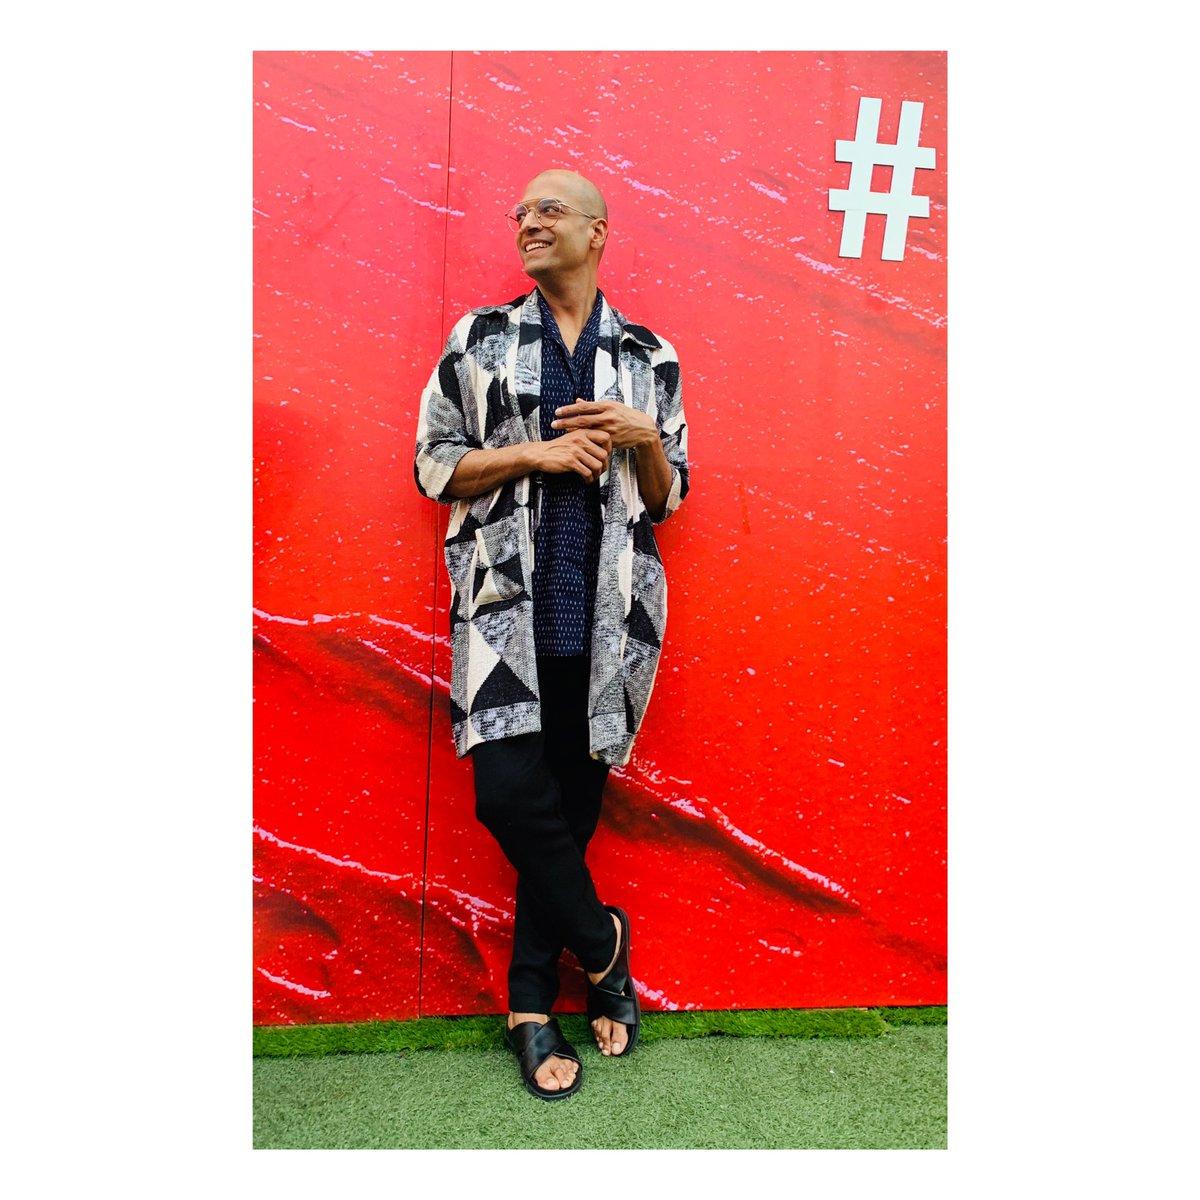 #mrgaba at #lakmefashionweek2020  day 3 #ValentinesDay2020 in #Yavi ensemble with @clarksshoes sandals. #menswear #Mensfashion #mensstyle #ootdfashion #ootdstyle #OOTDGoals #Throwbackpic.twitter.com/b1ZcbEGl0x